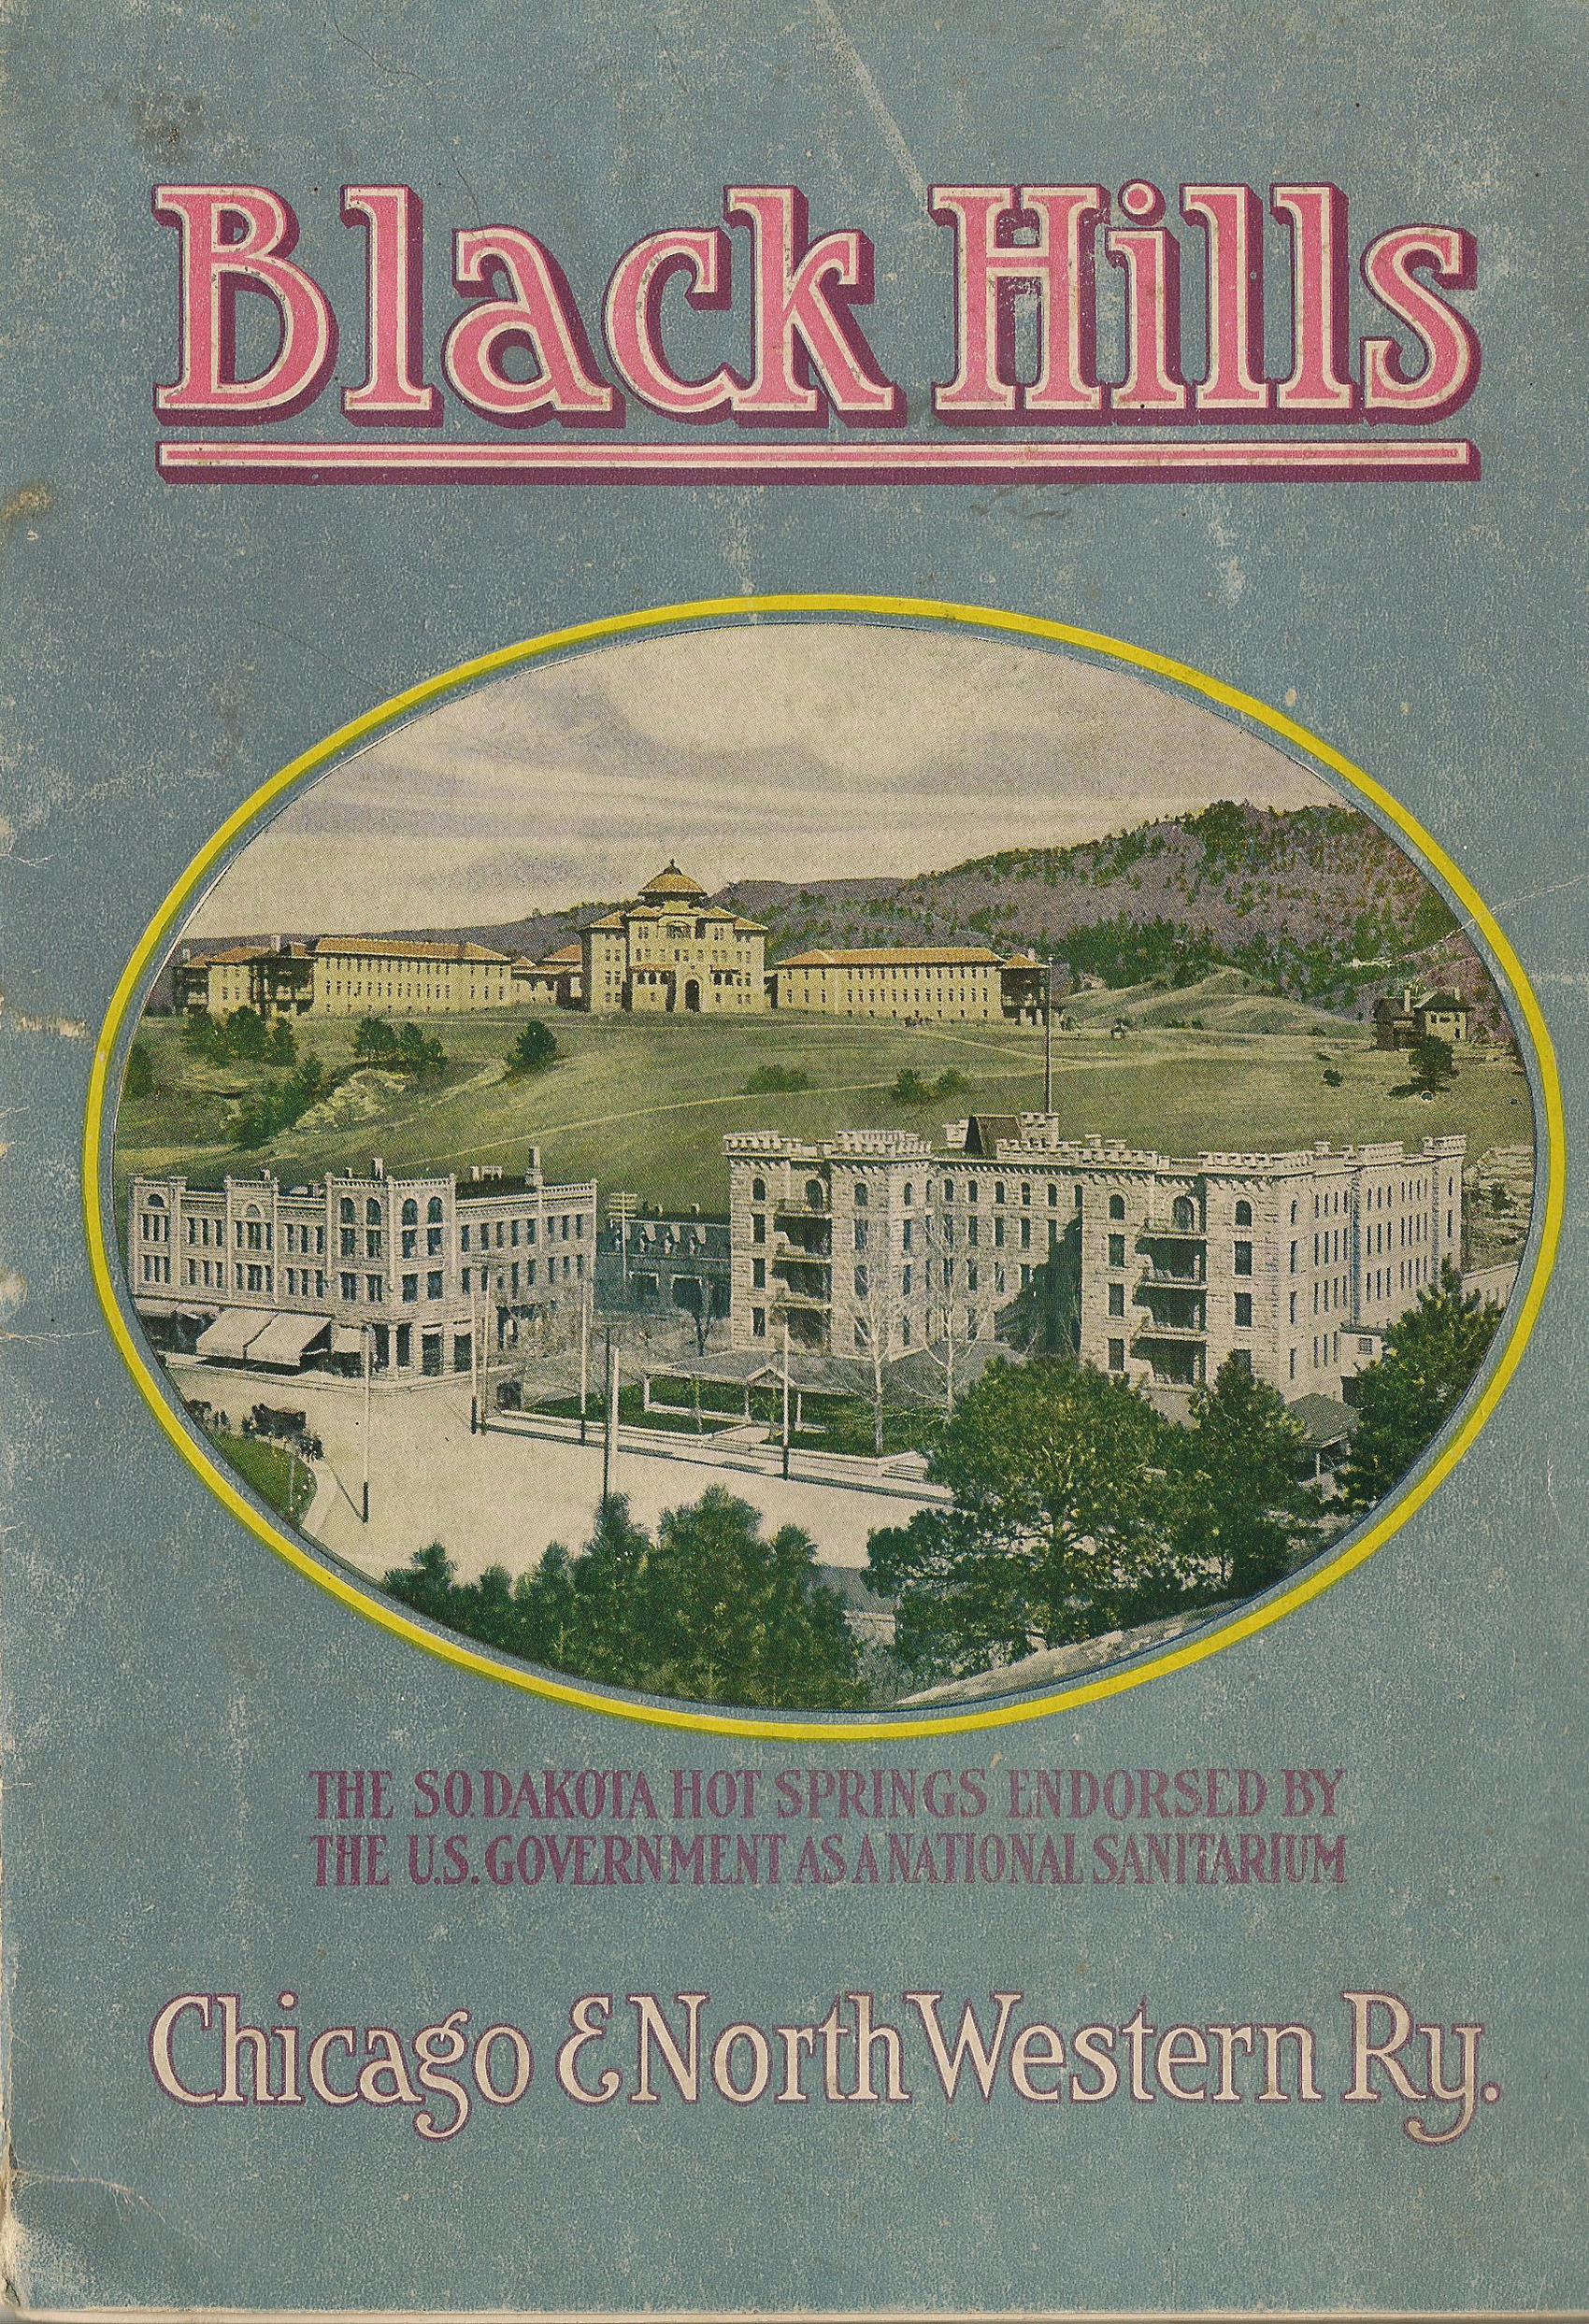 Image - railroadbrochure.JPG